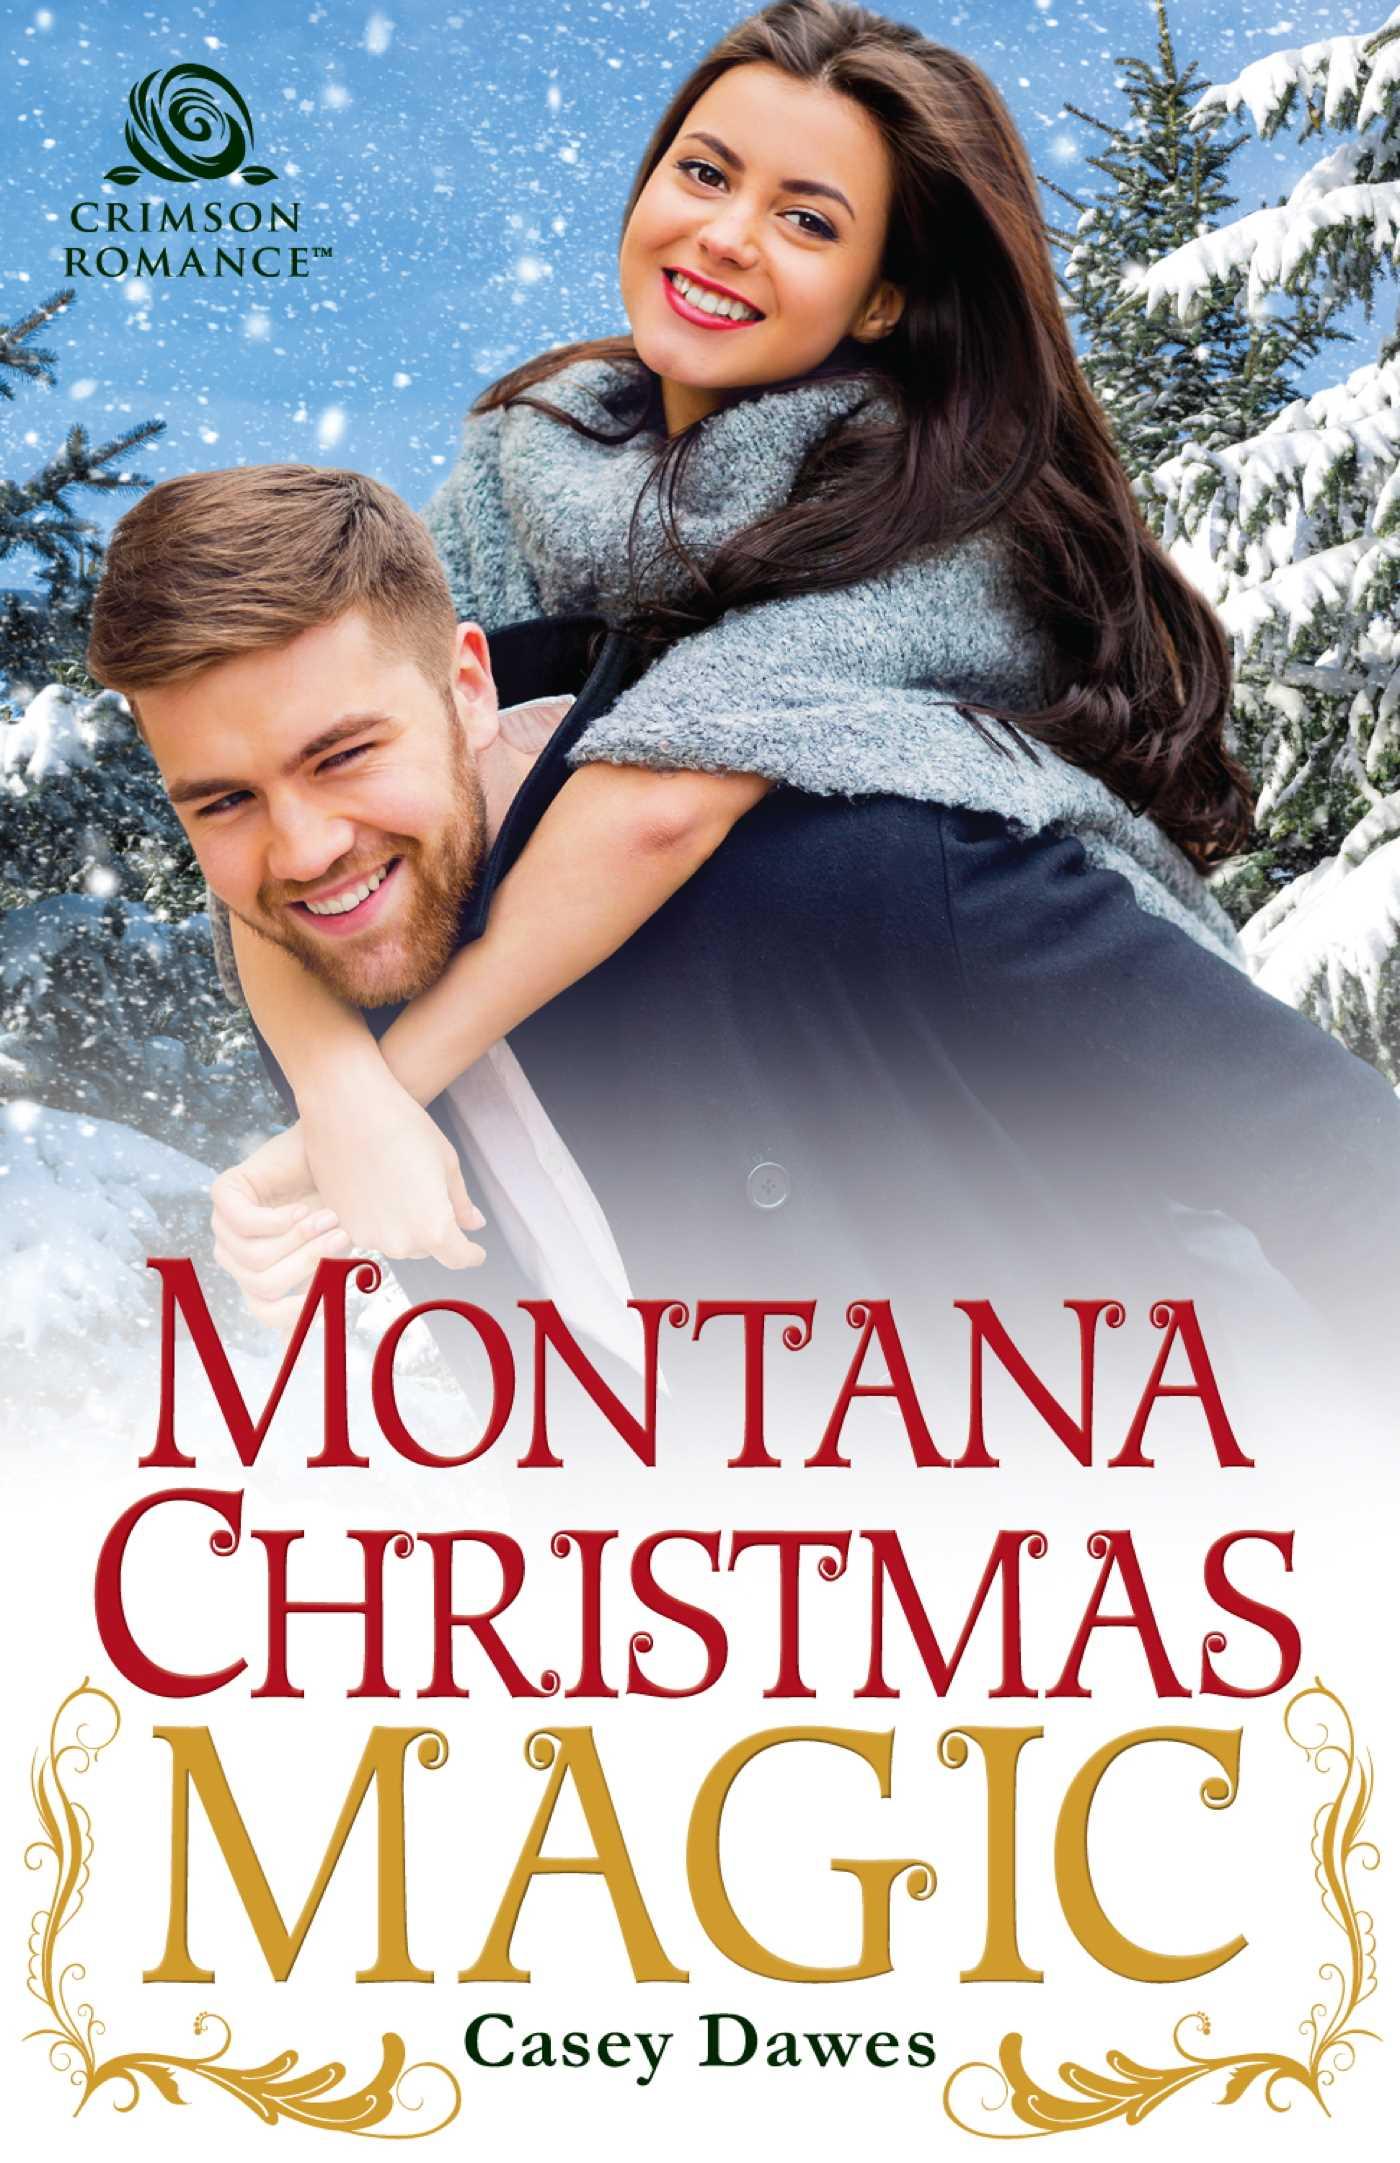 montana christmas magic 9781507202517 hr - Christmas Magic Movie